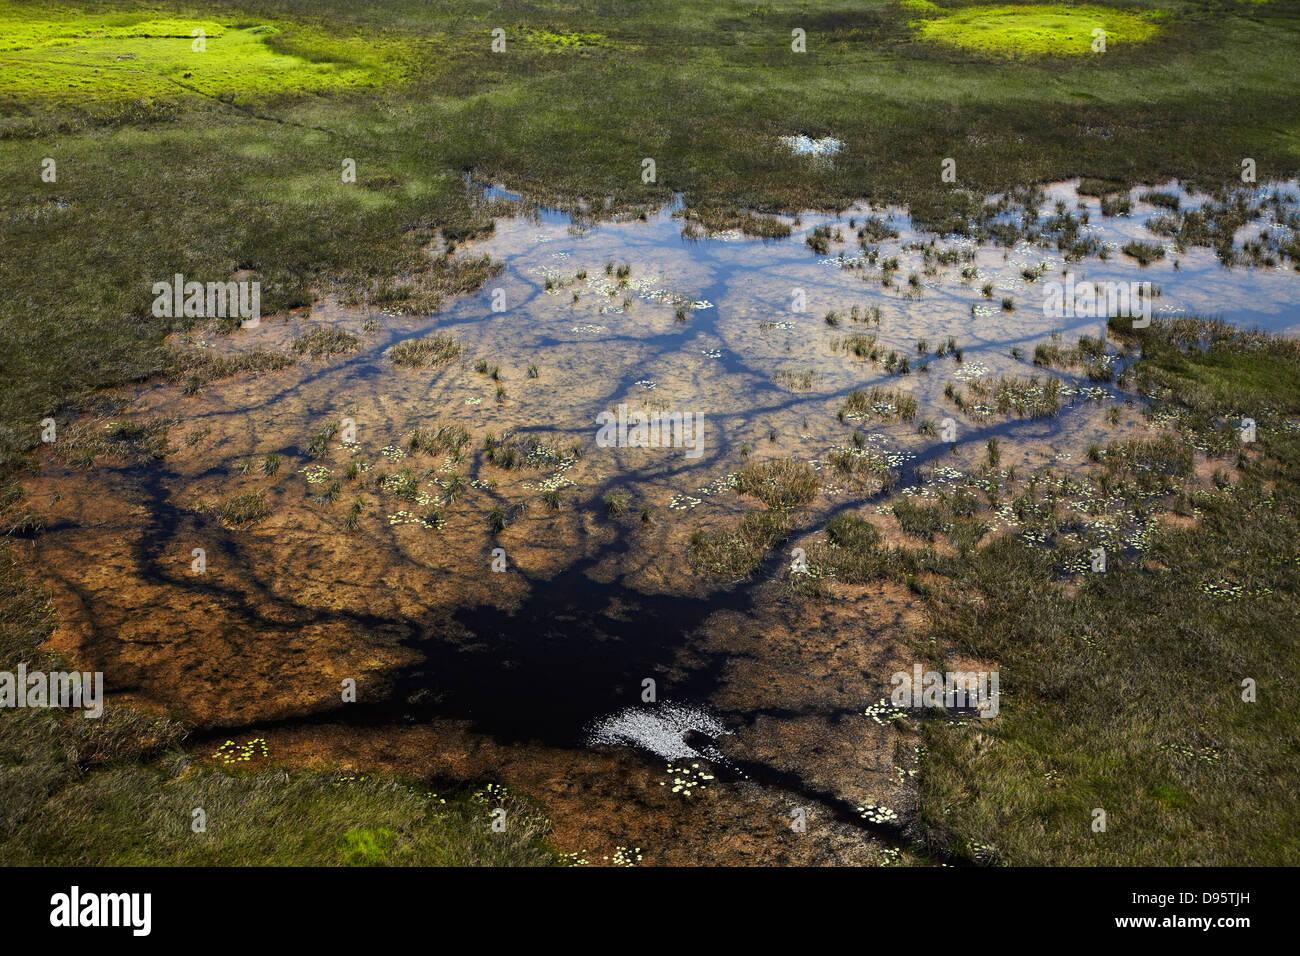 Animal tracks through the swamp, Okavango Delta, Botswana, Africa- aerial - Stock Image